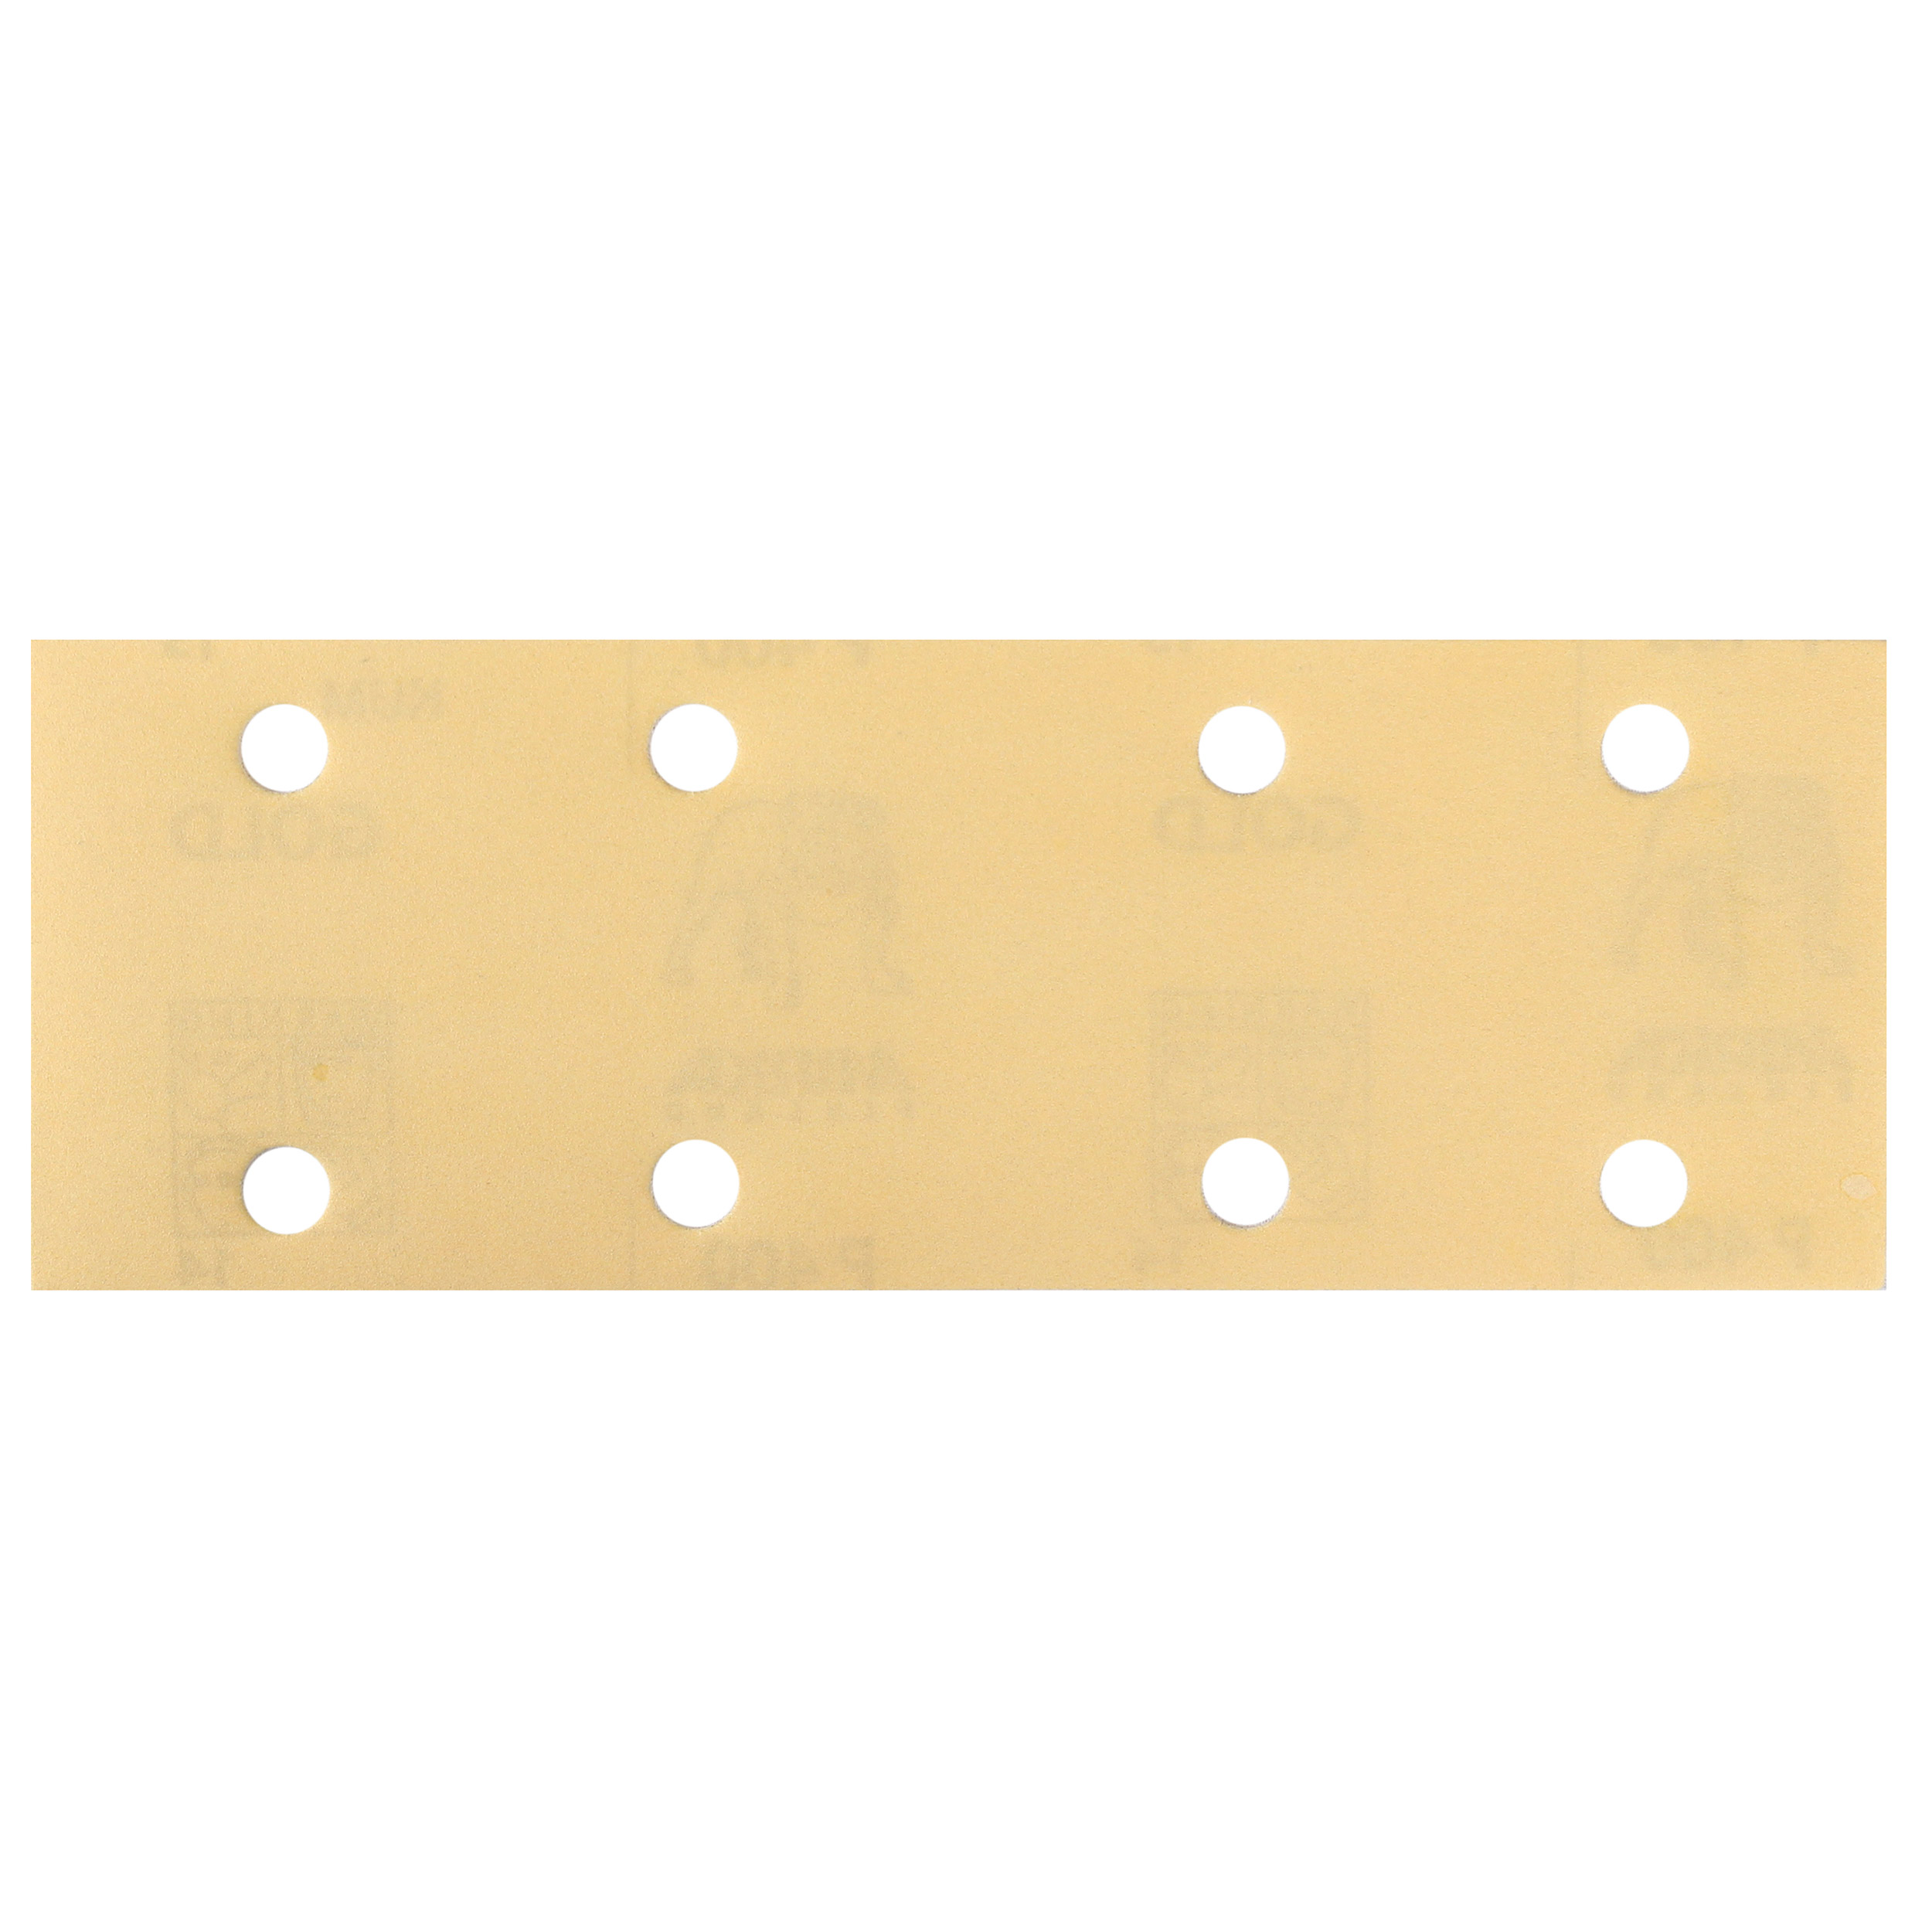 "Q.SILVER ACE 2.75x8"" Grip Sandpaper, 8H P80, 50 Sheets/Box"